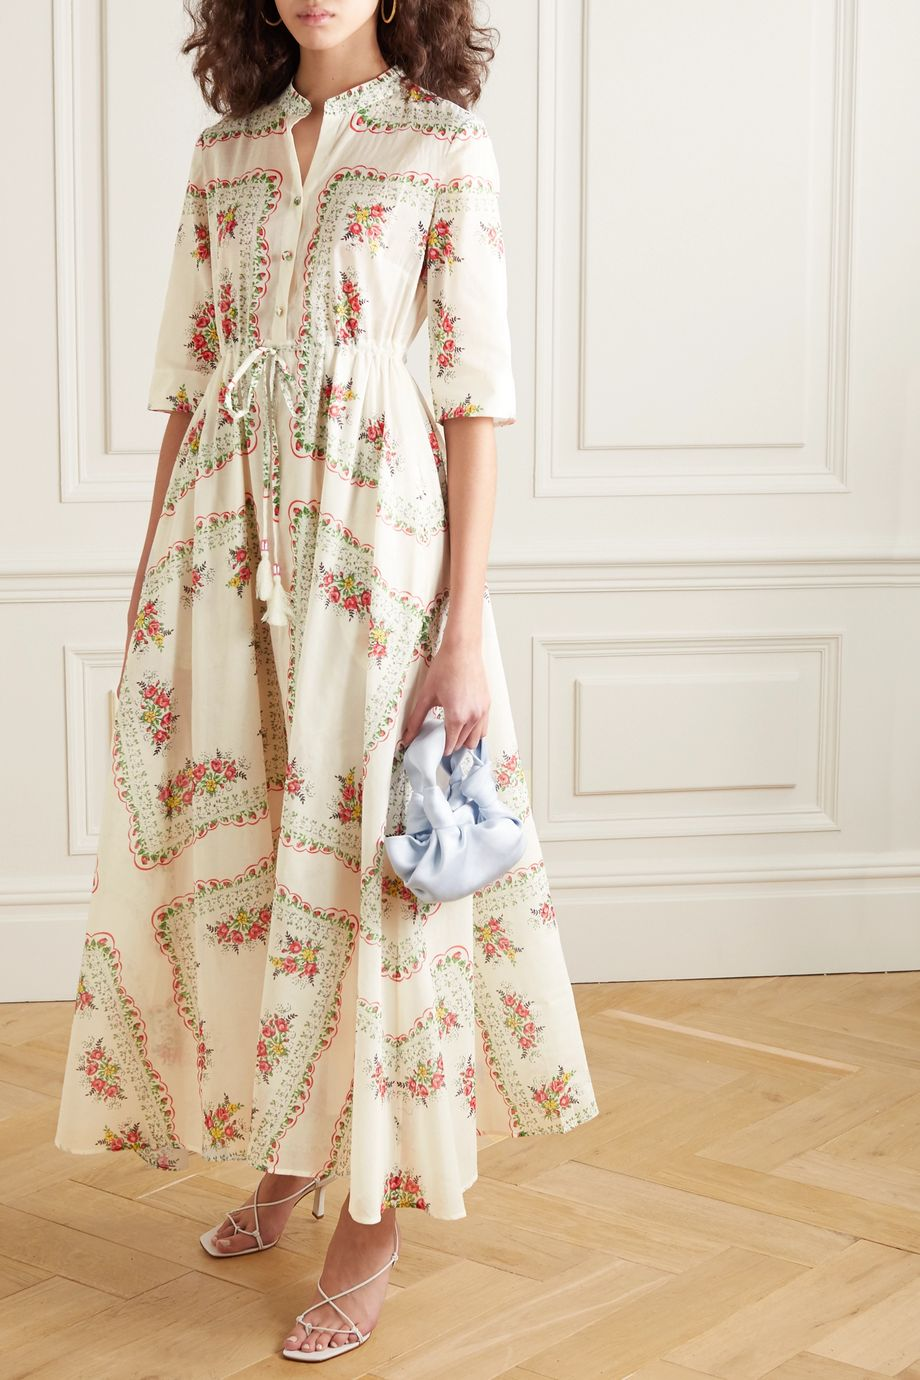 Tory Burch Maxi-Hemdblusenkleid aus Baumwollpopeline mit Blumenprint